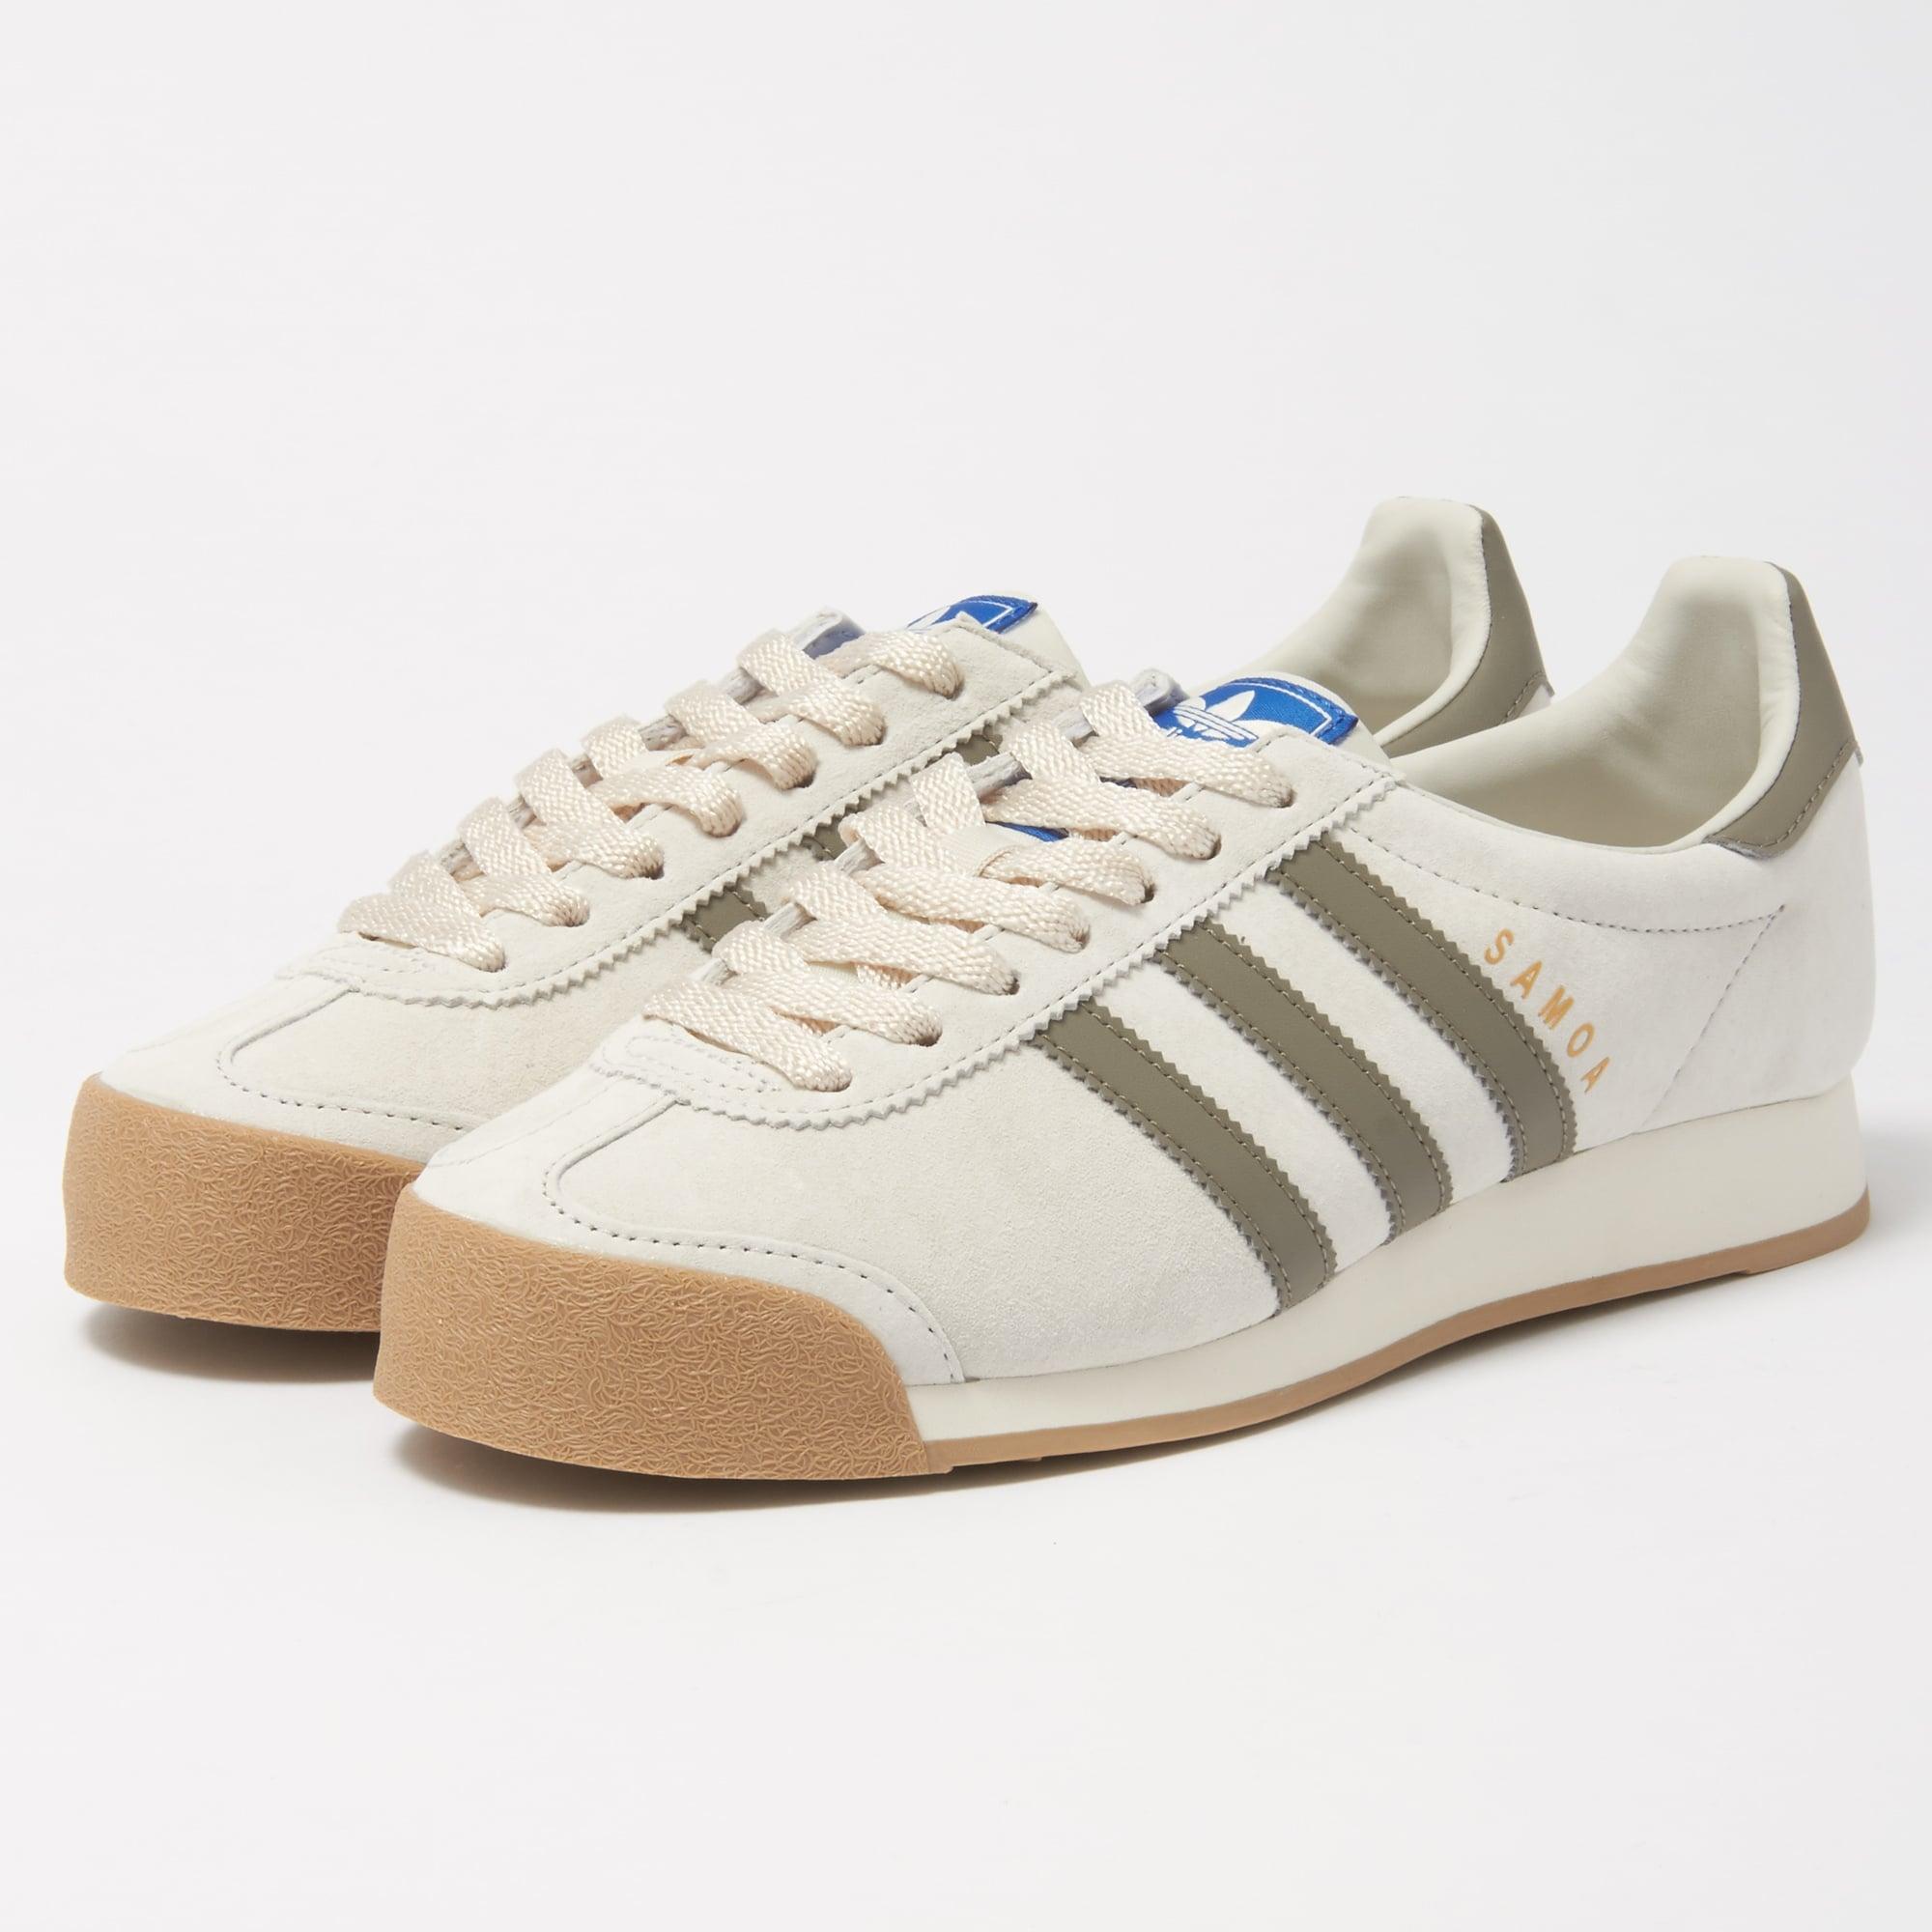 adidas originals samoa vintage trainers nz